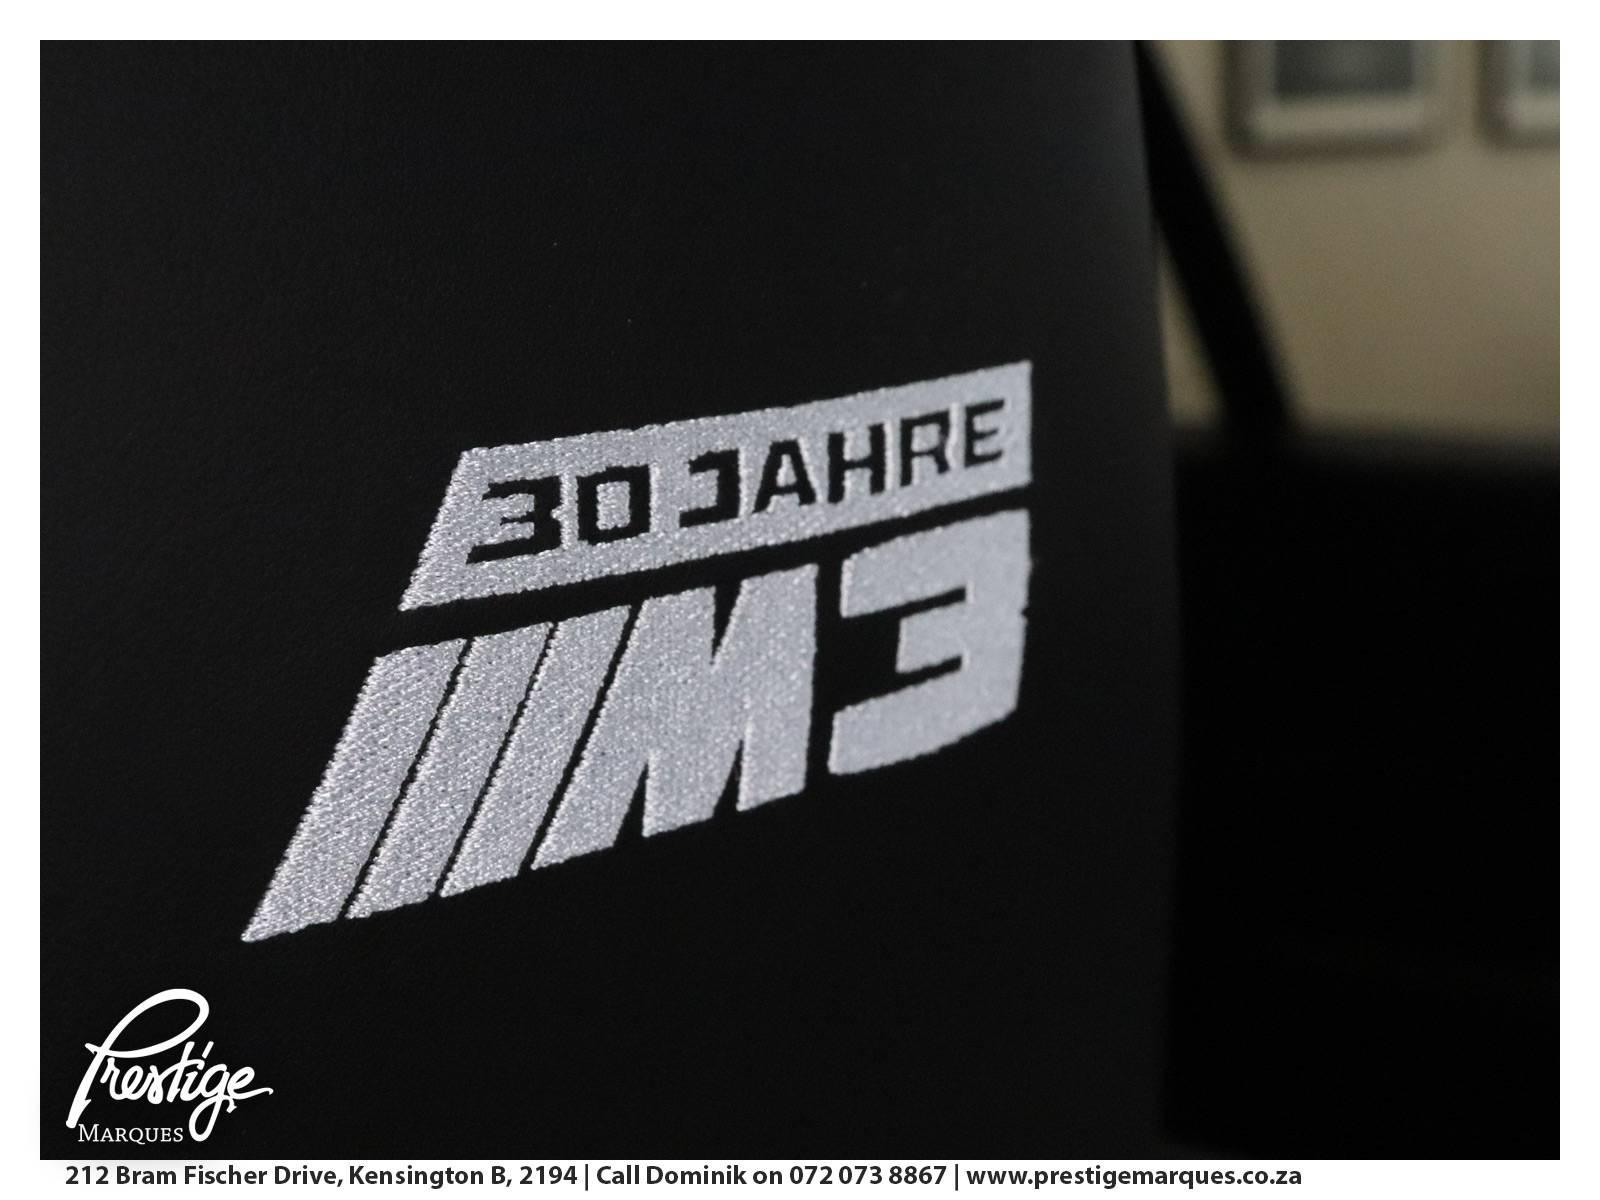 2016-BMW-M3-MDCT-30-Jarare-Prestige-Marques-Randburg-Sandton-18